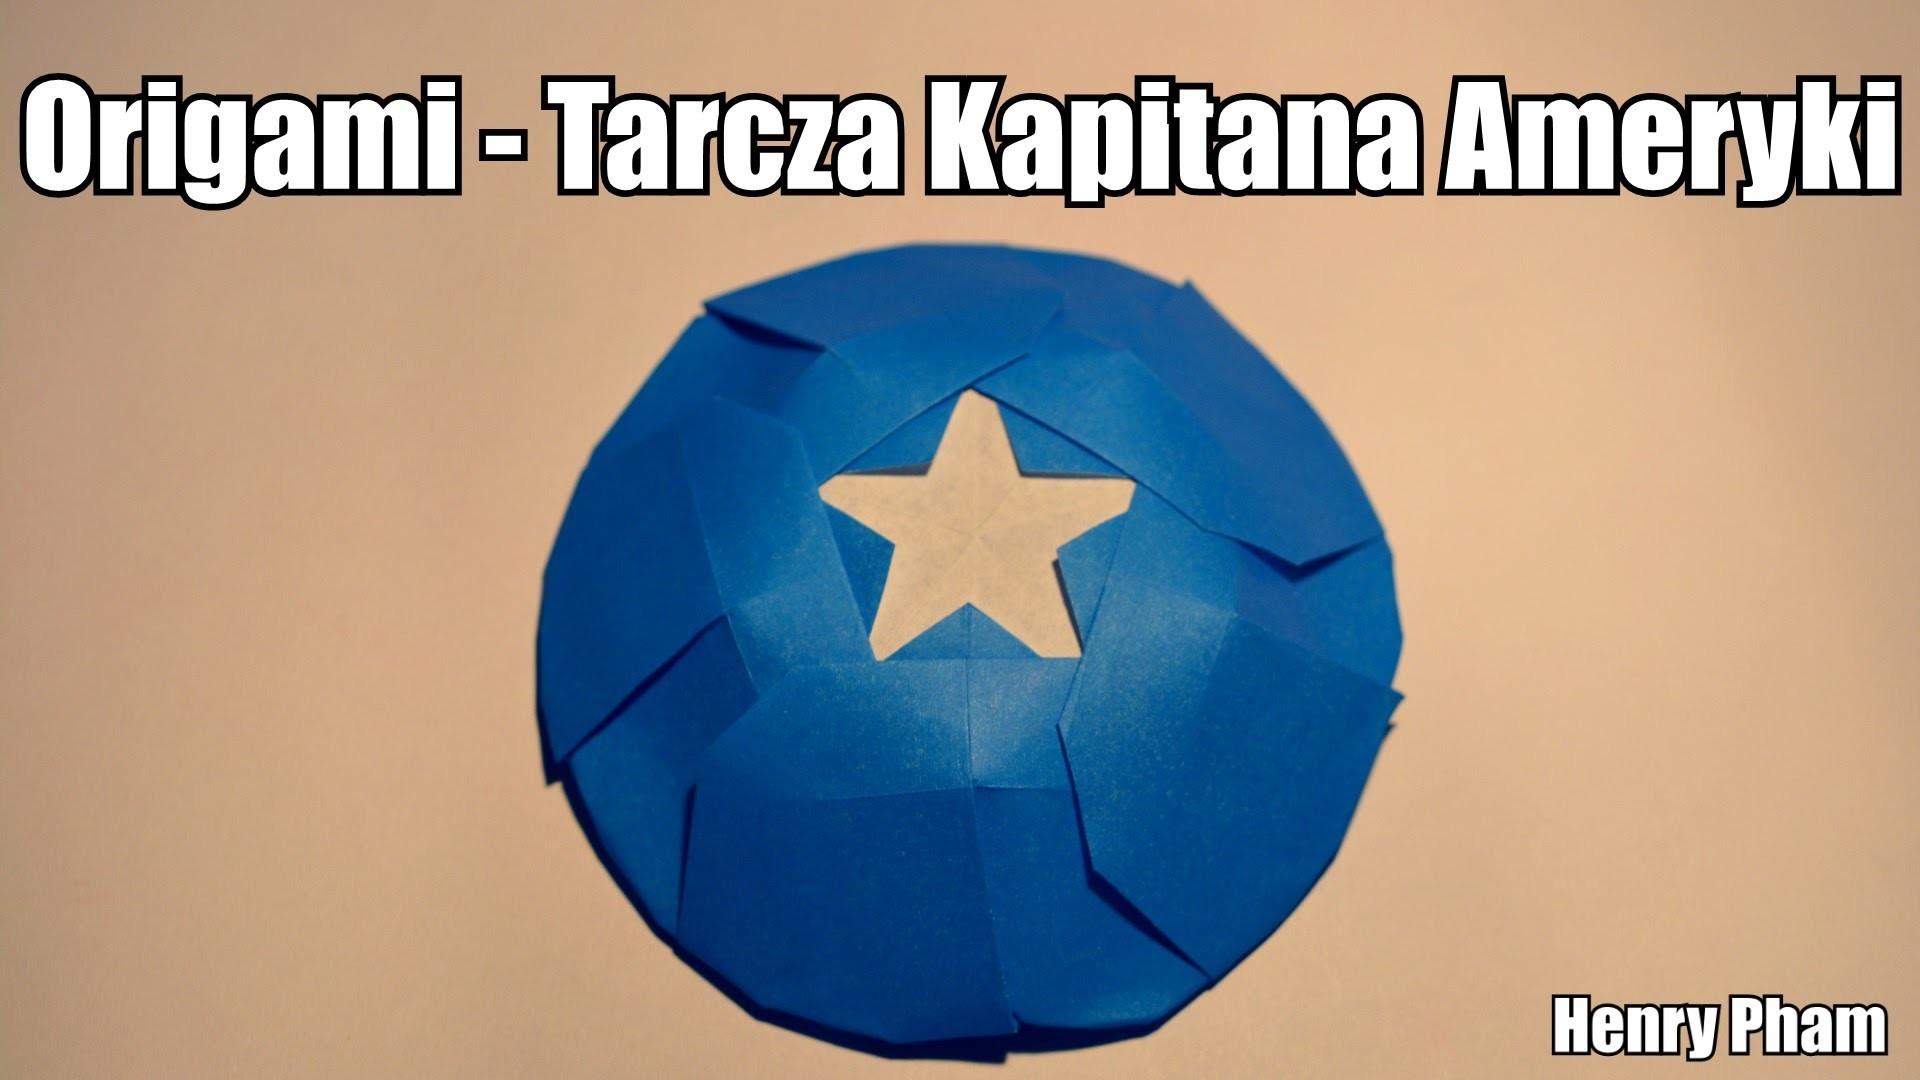 Origami - Tarcza Kapitana Ameryki